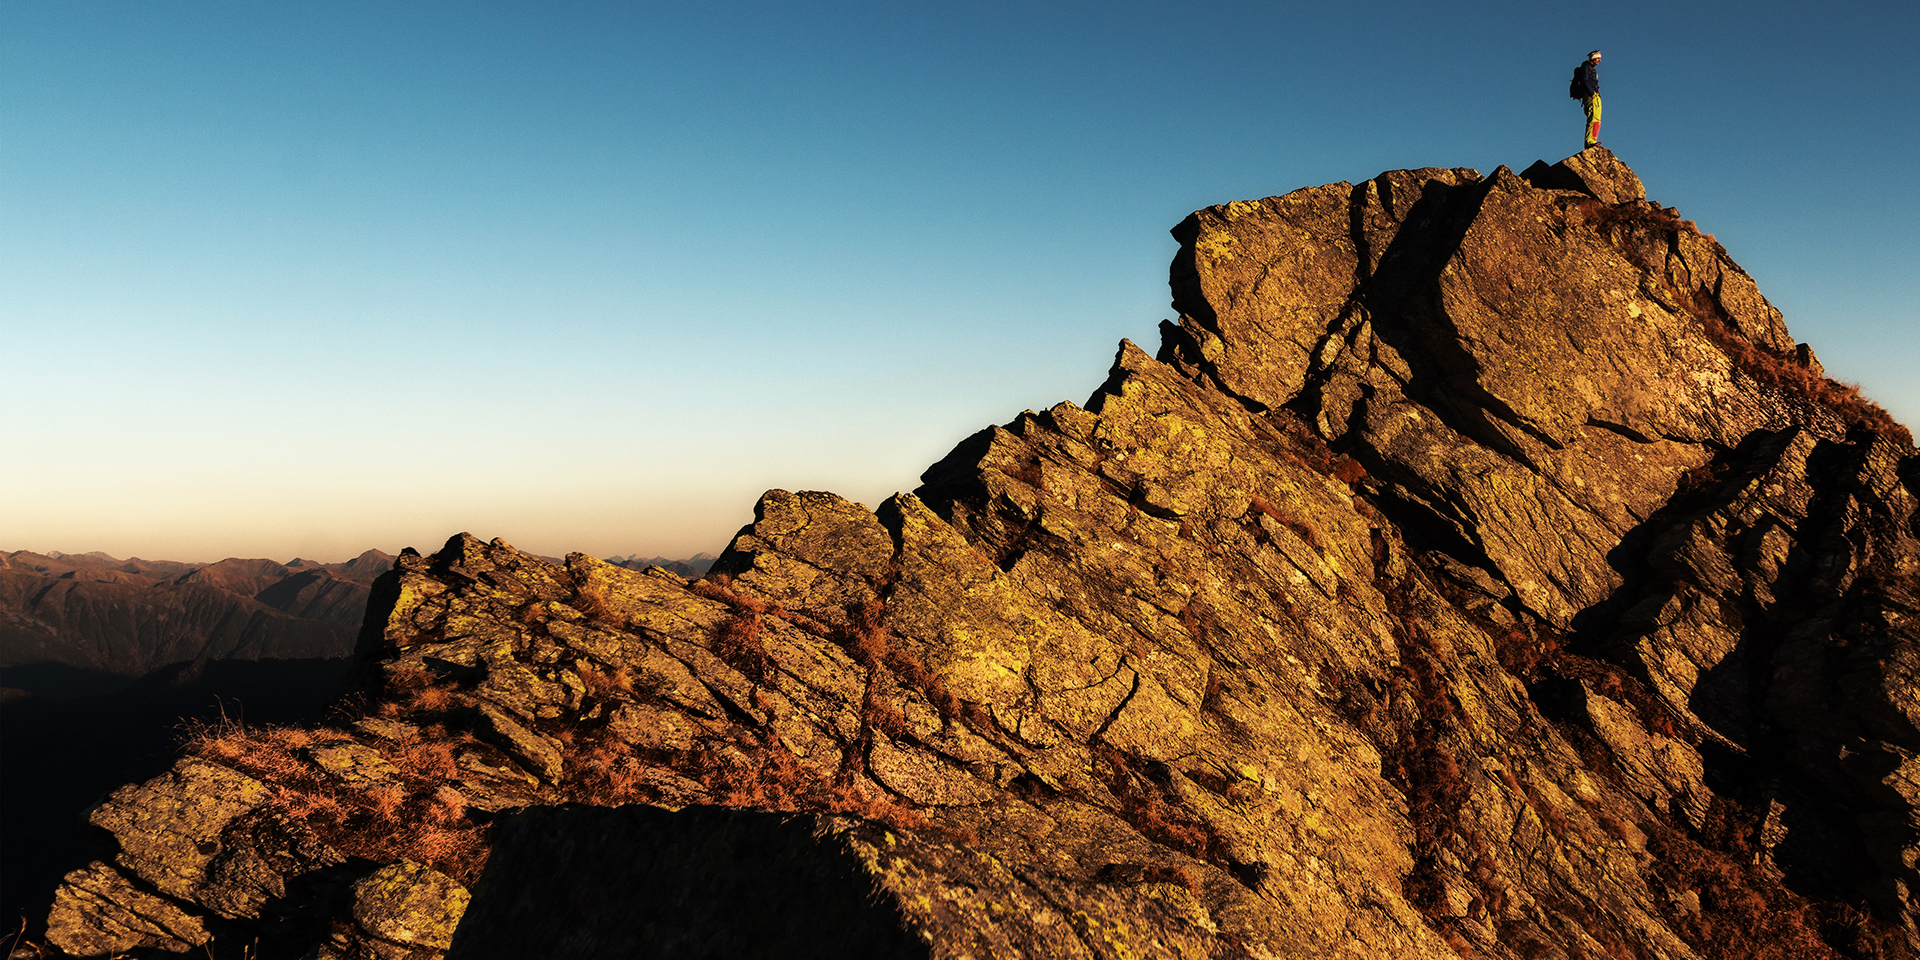 Acomplishment tips from tina: 5 stages of accomplishment - tel hai